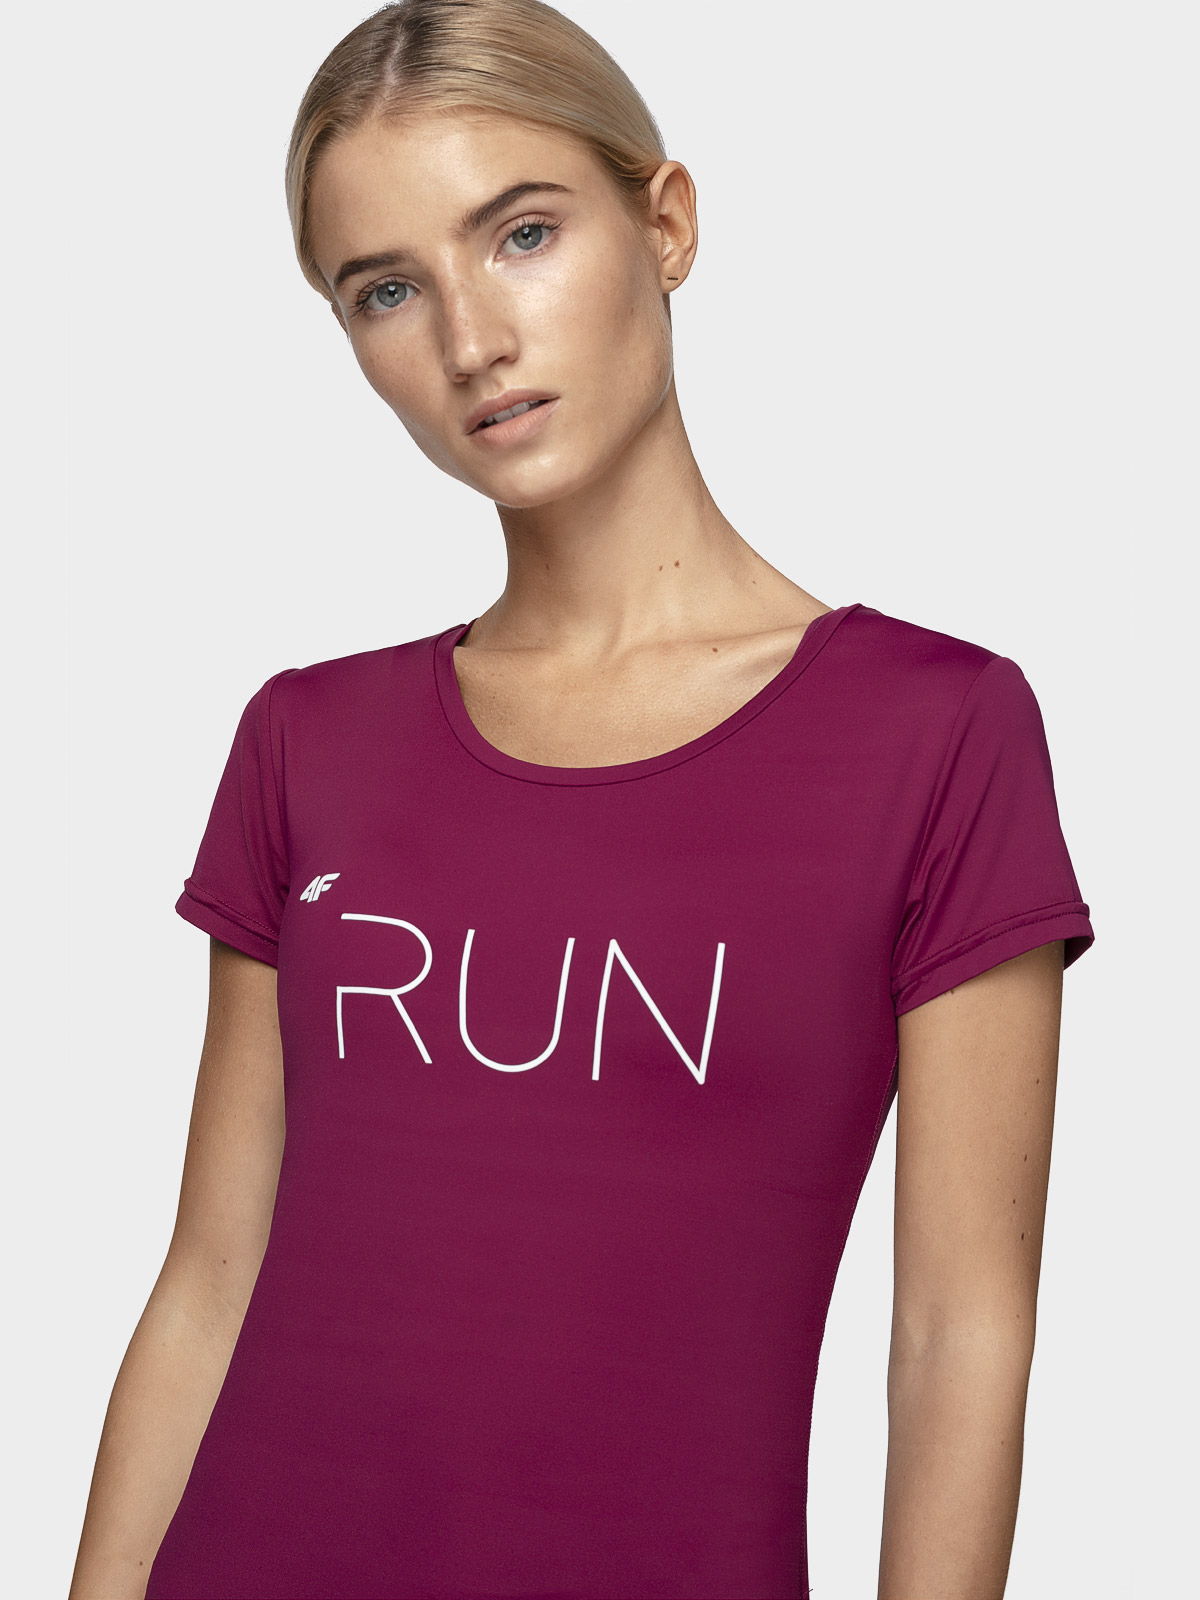 Koszulka do biegania damska TSDF165 - burgund